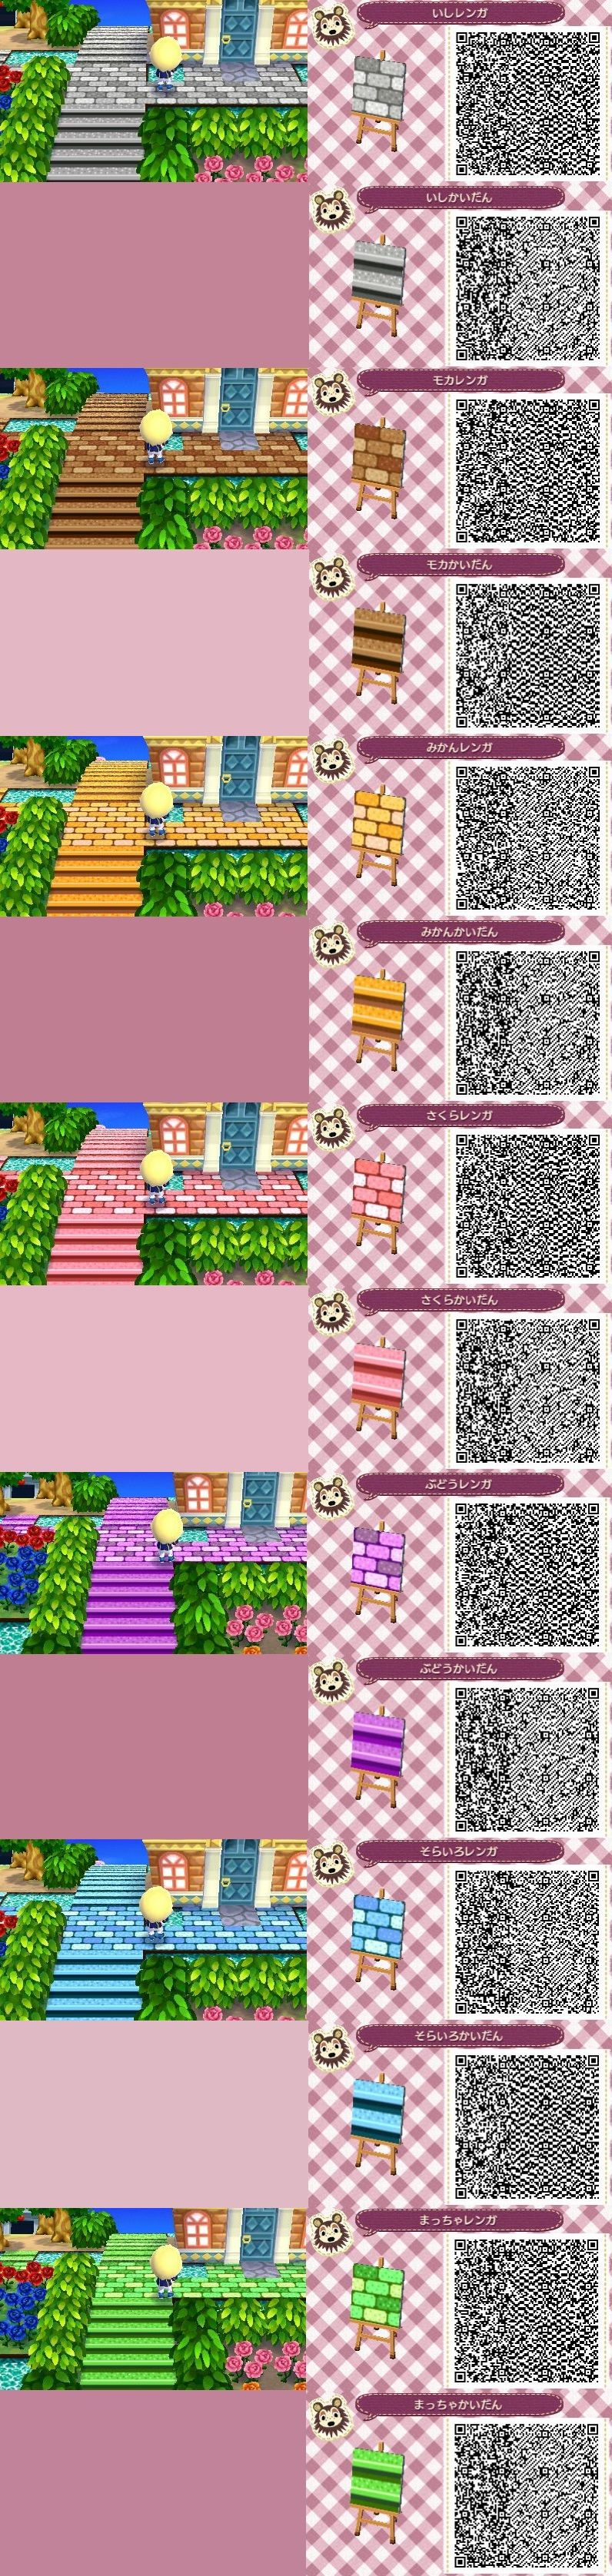 f1052527ee298200257a68be29603308.jpg 796×3,353 pixels